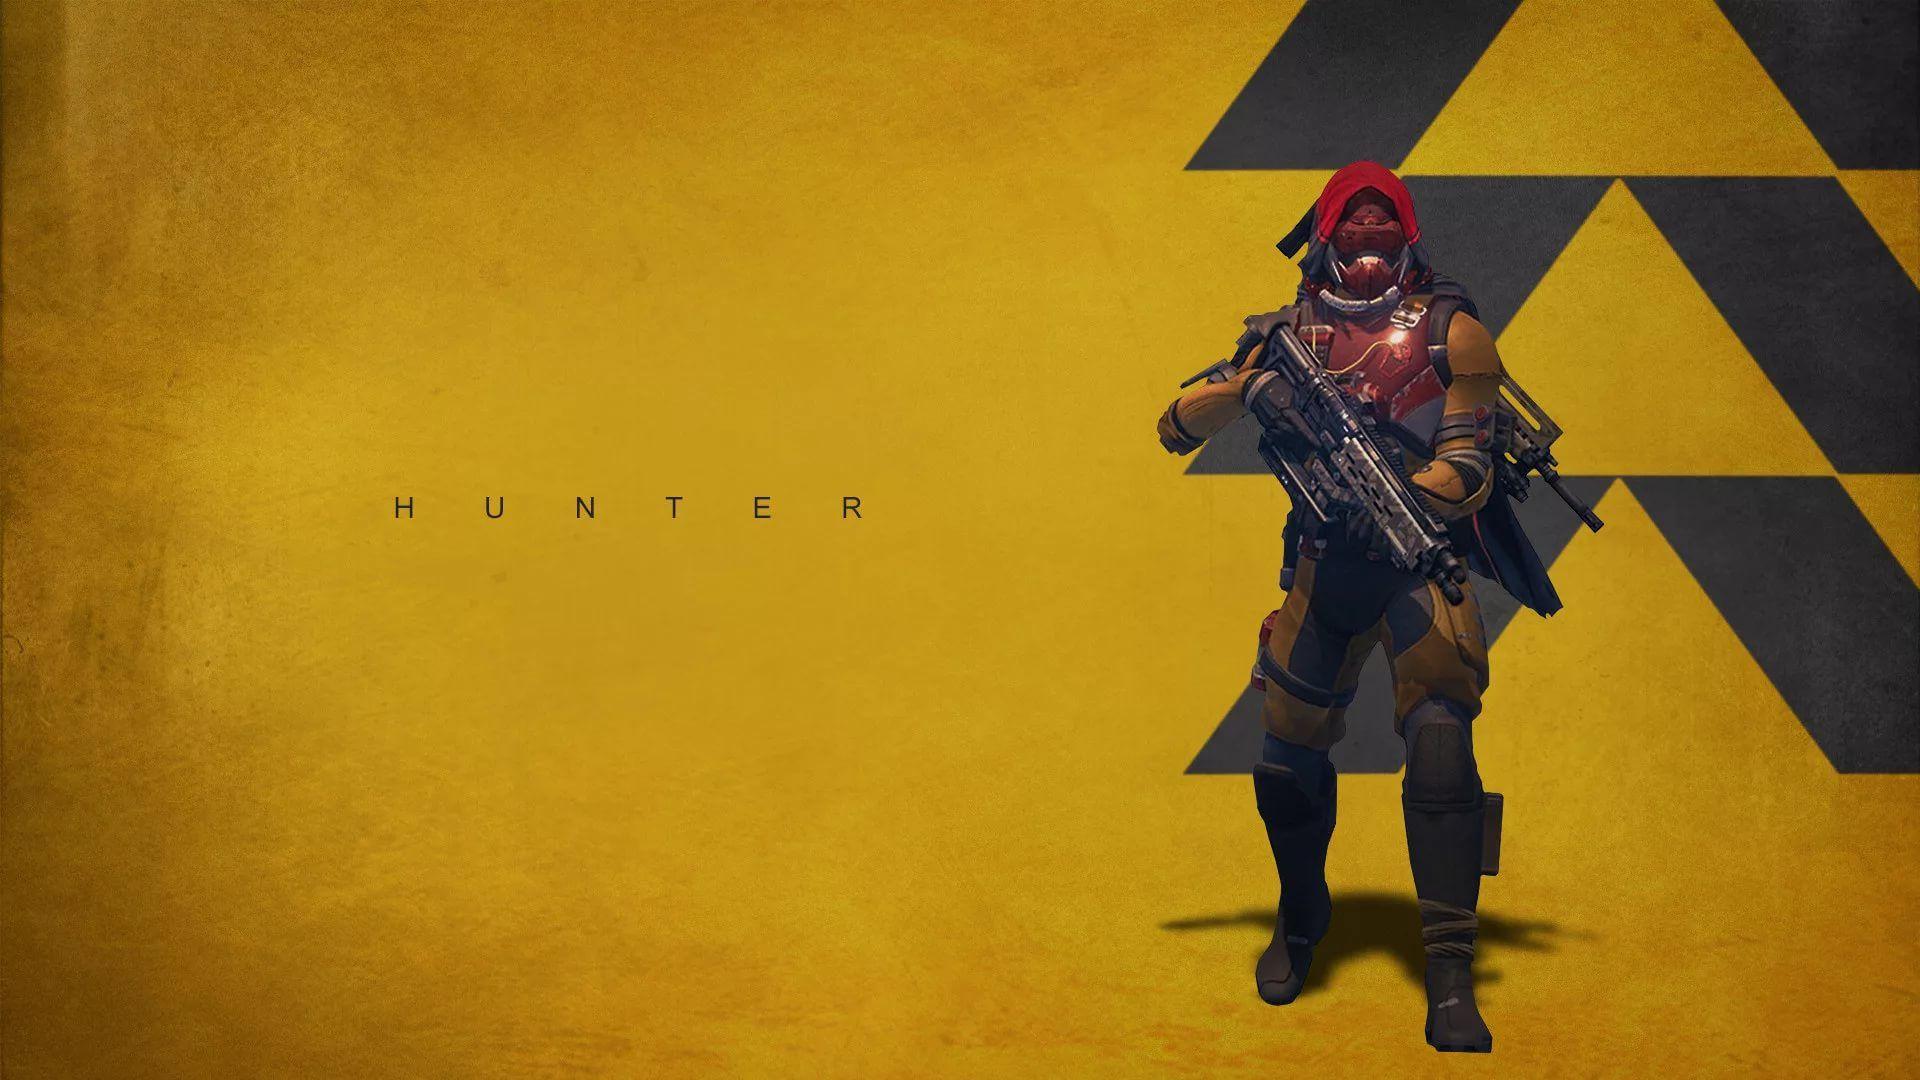 Destiny Hunter free hd wallpaper